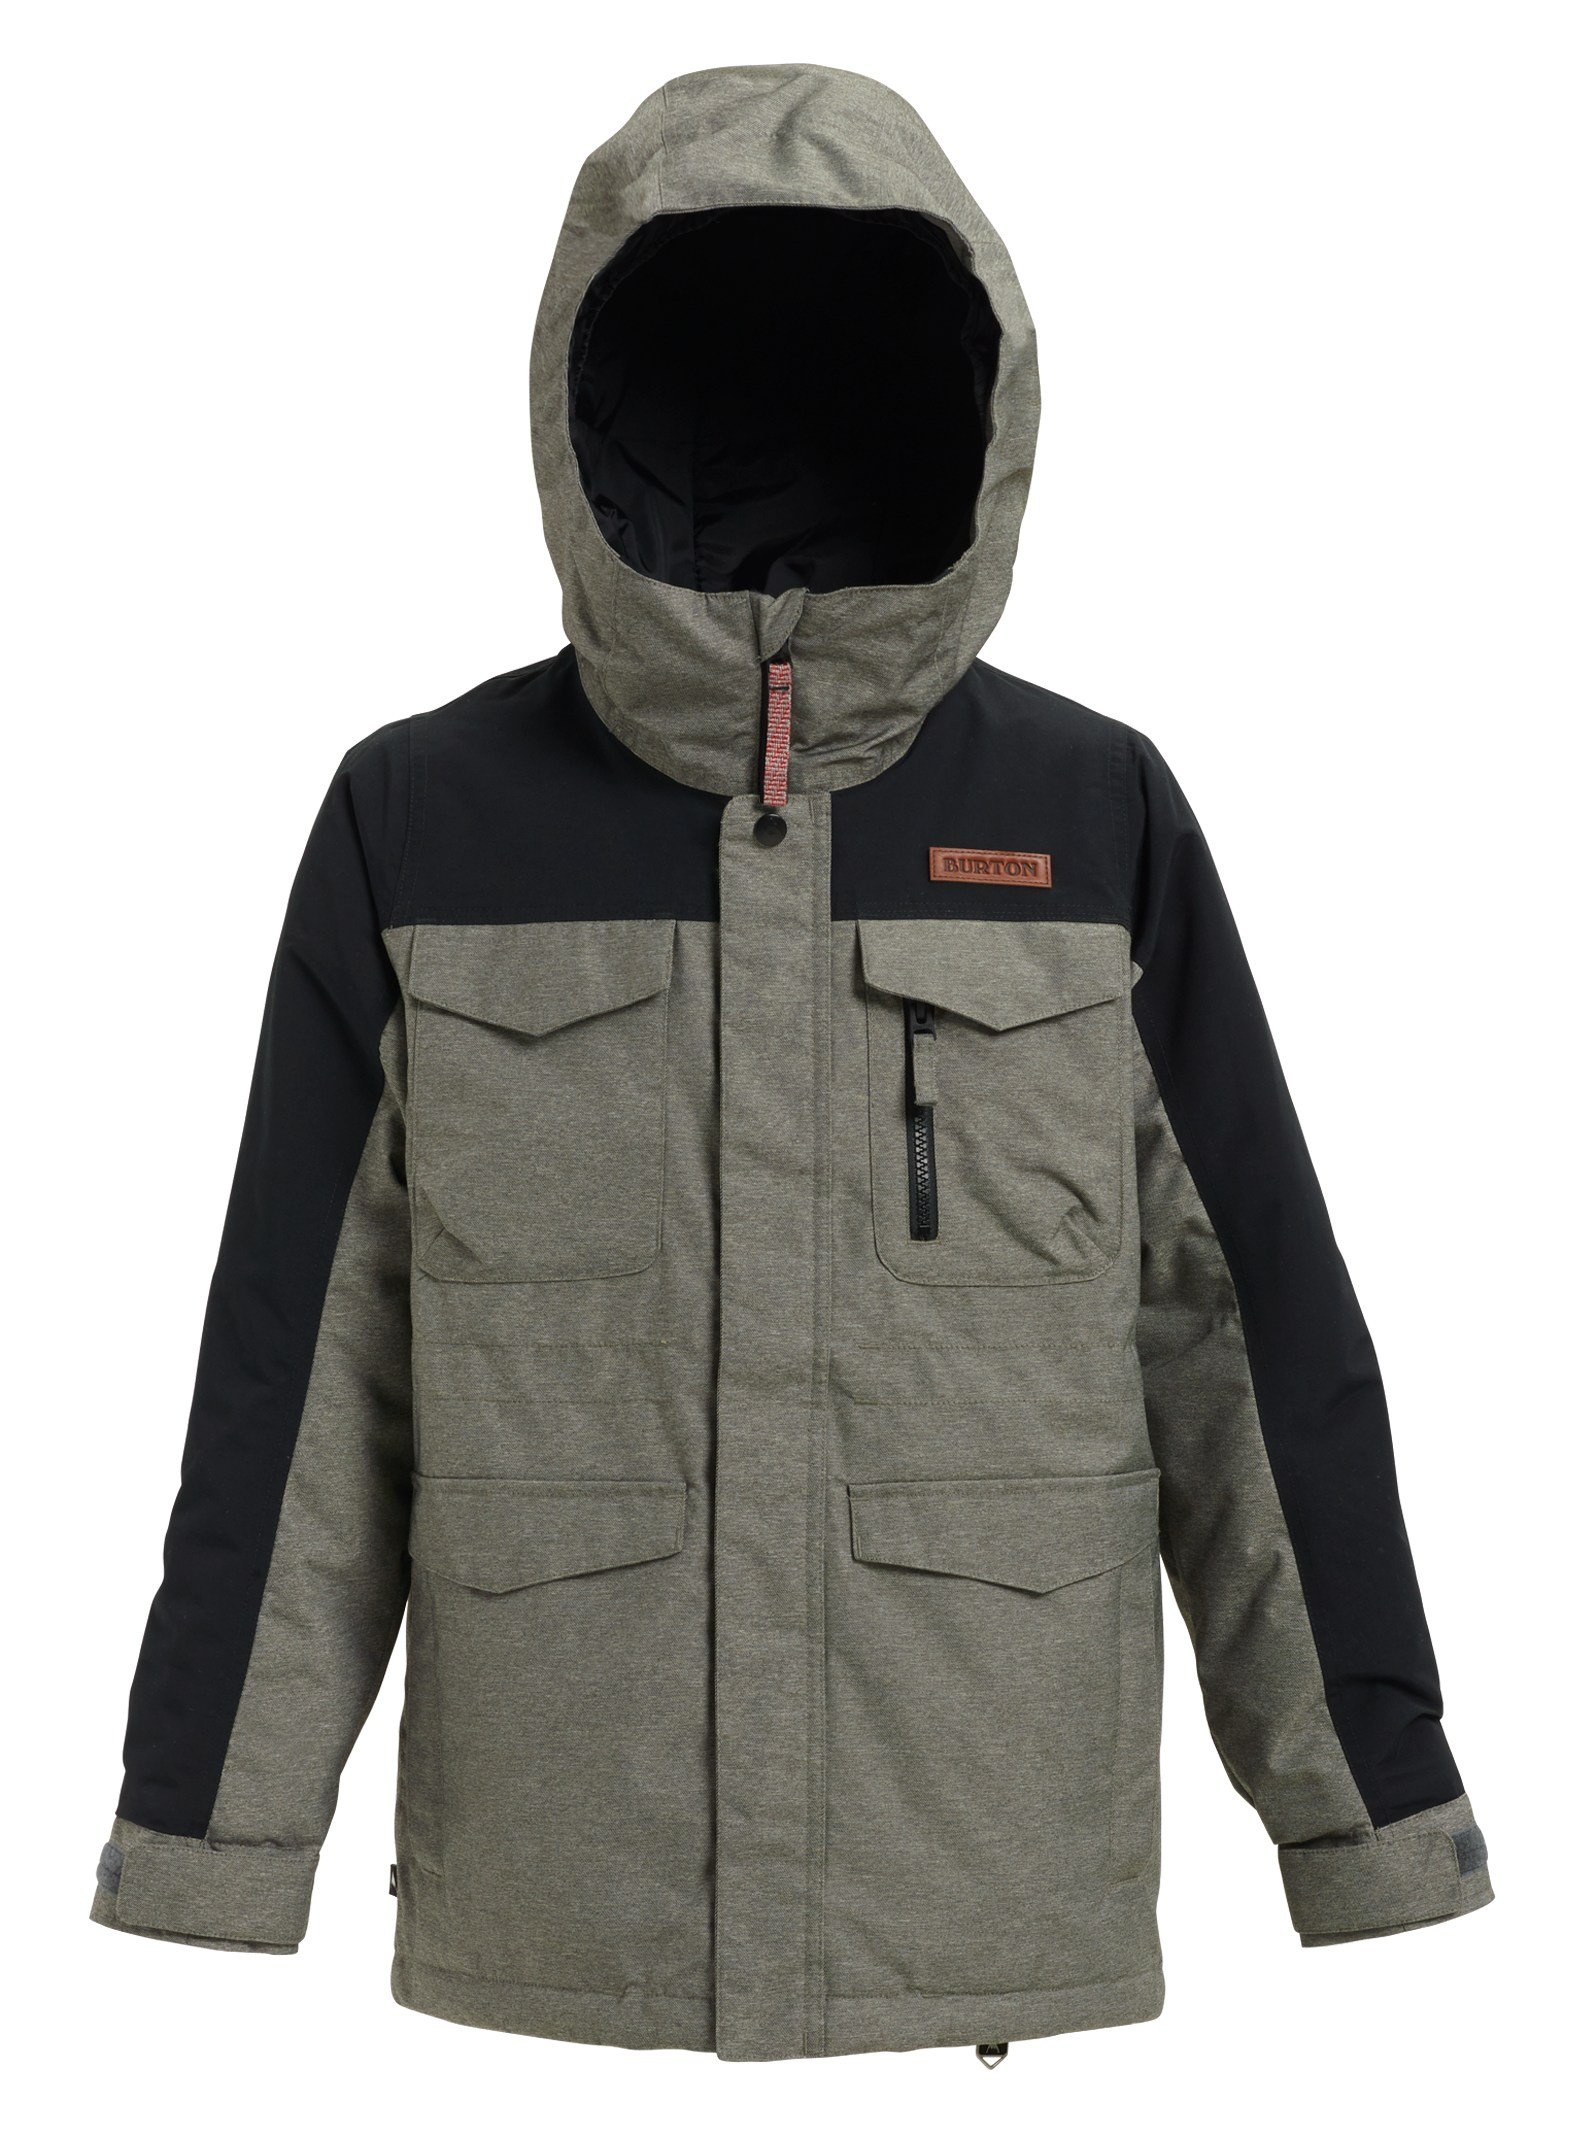 fd81d67f7 buyr.com - Burton Covert Jacket